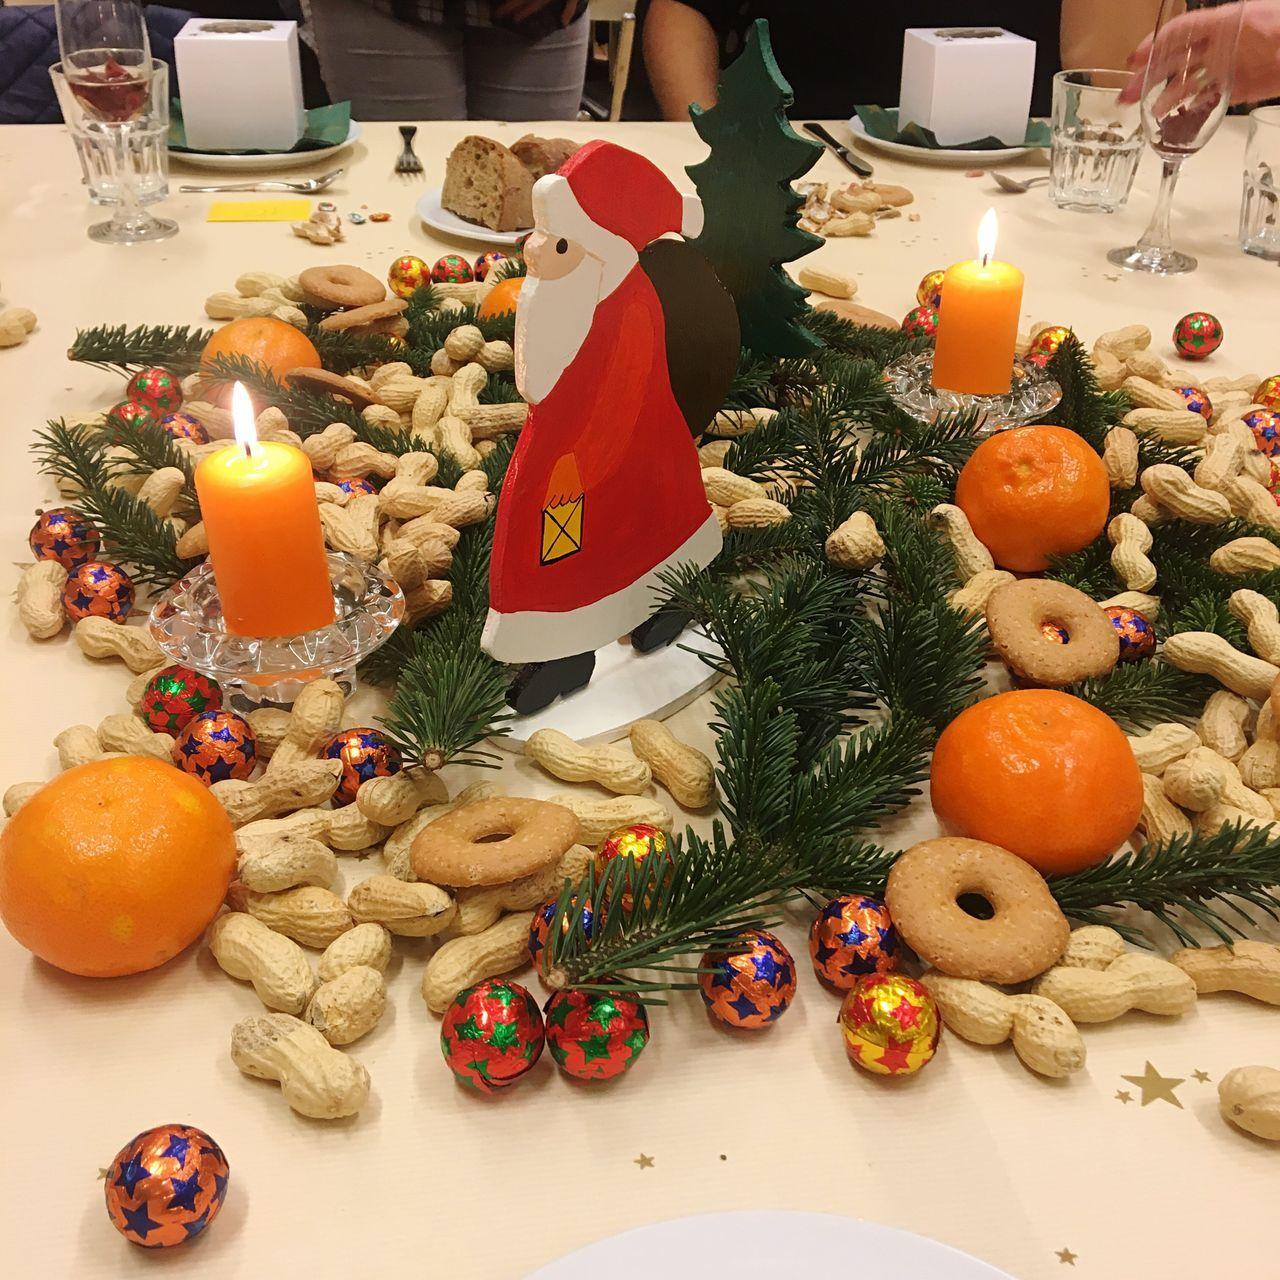 Decoration Christmas Decoration Samichlaus Nuts Mandarins Orange Candle